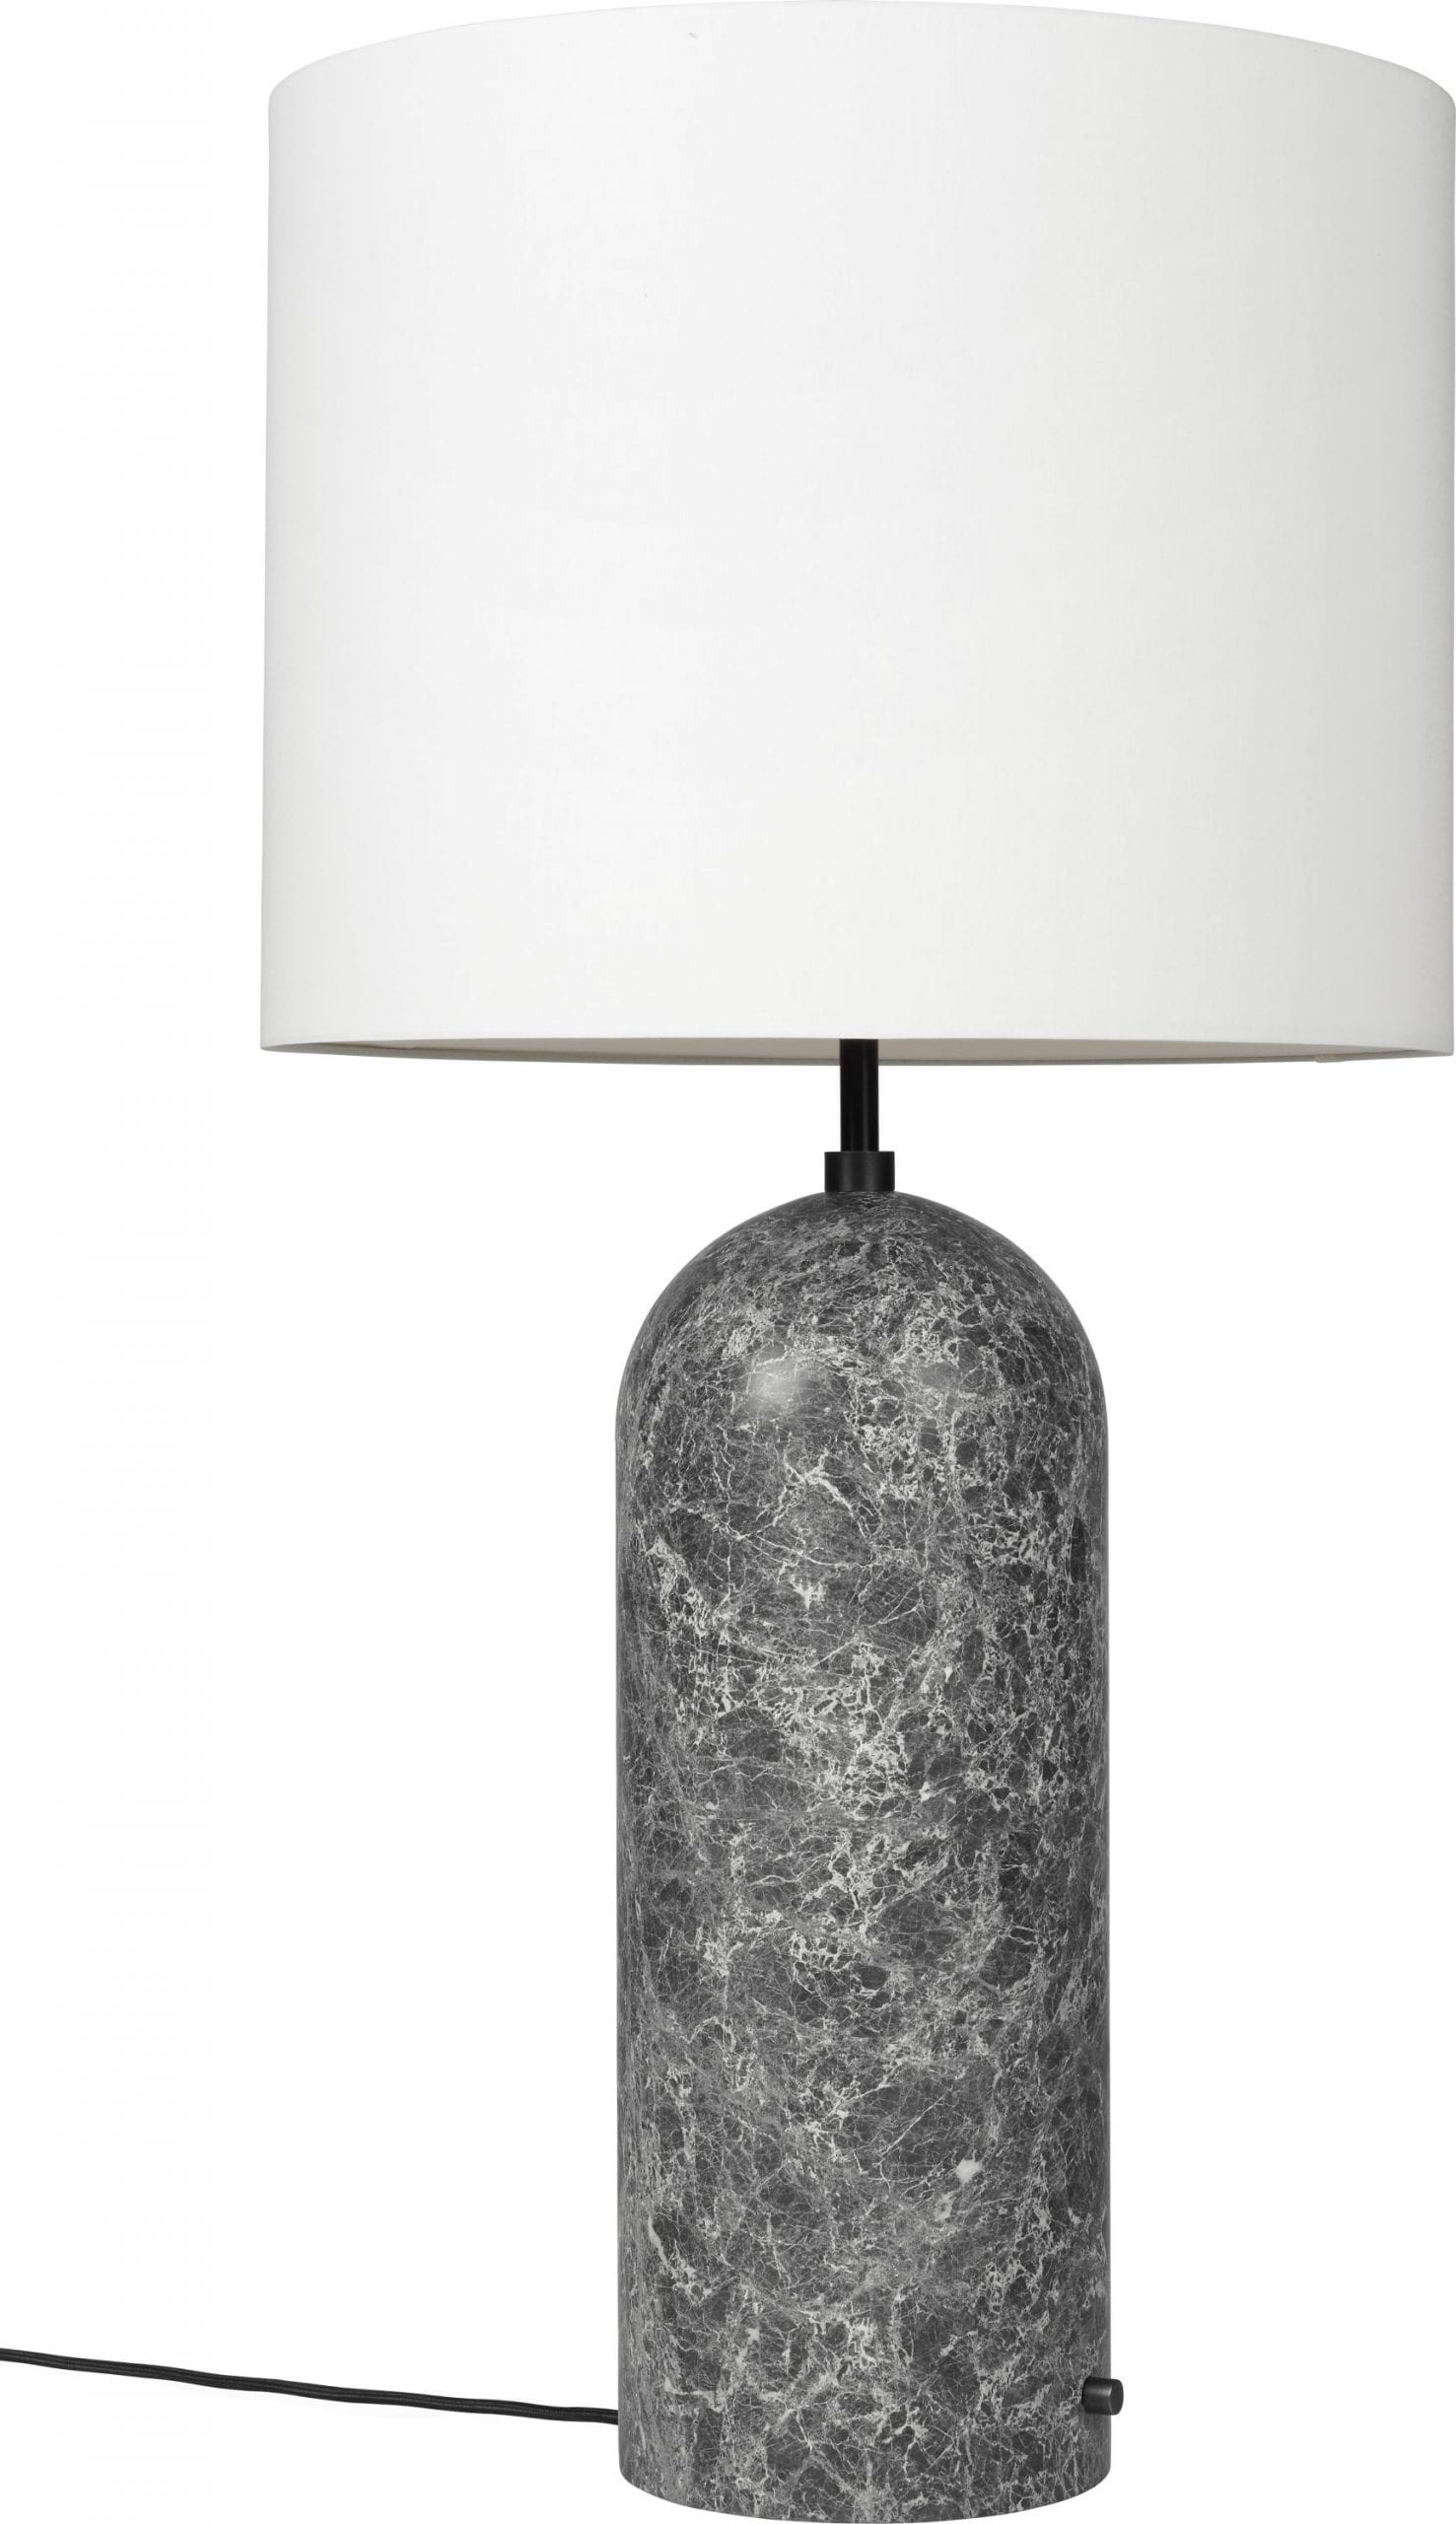 Gravity Floor Lamp, XL Low